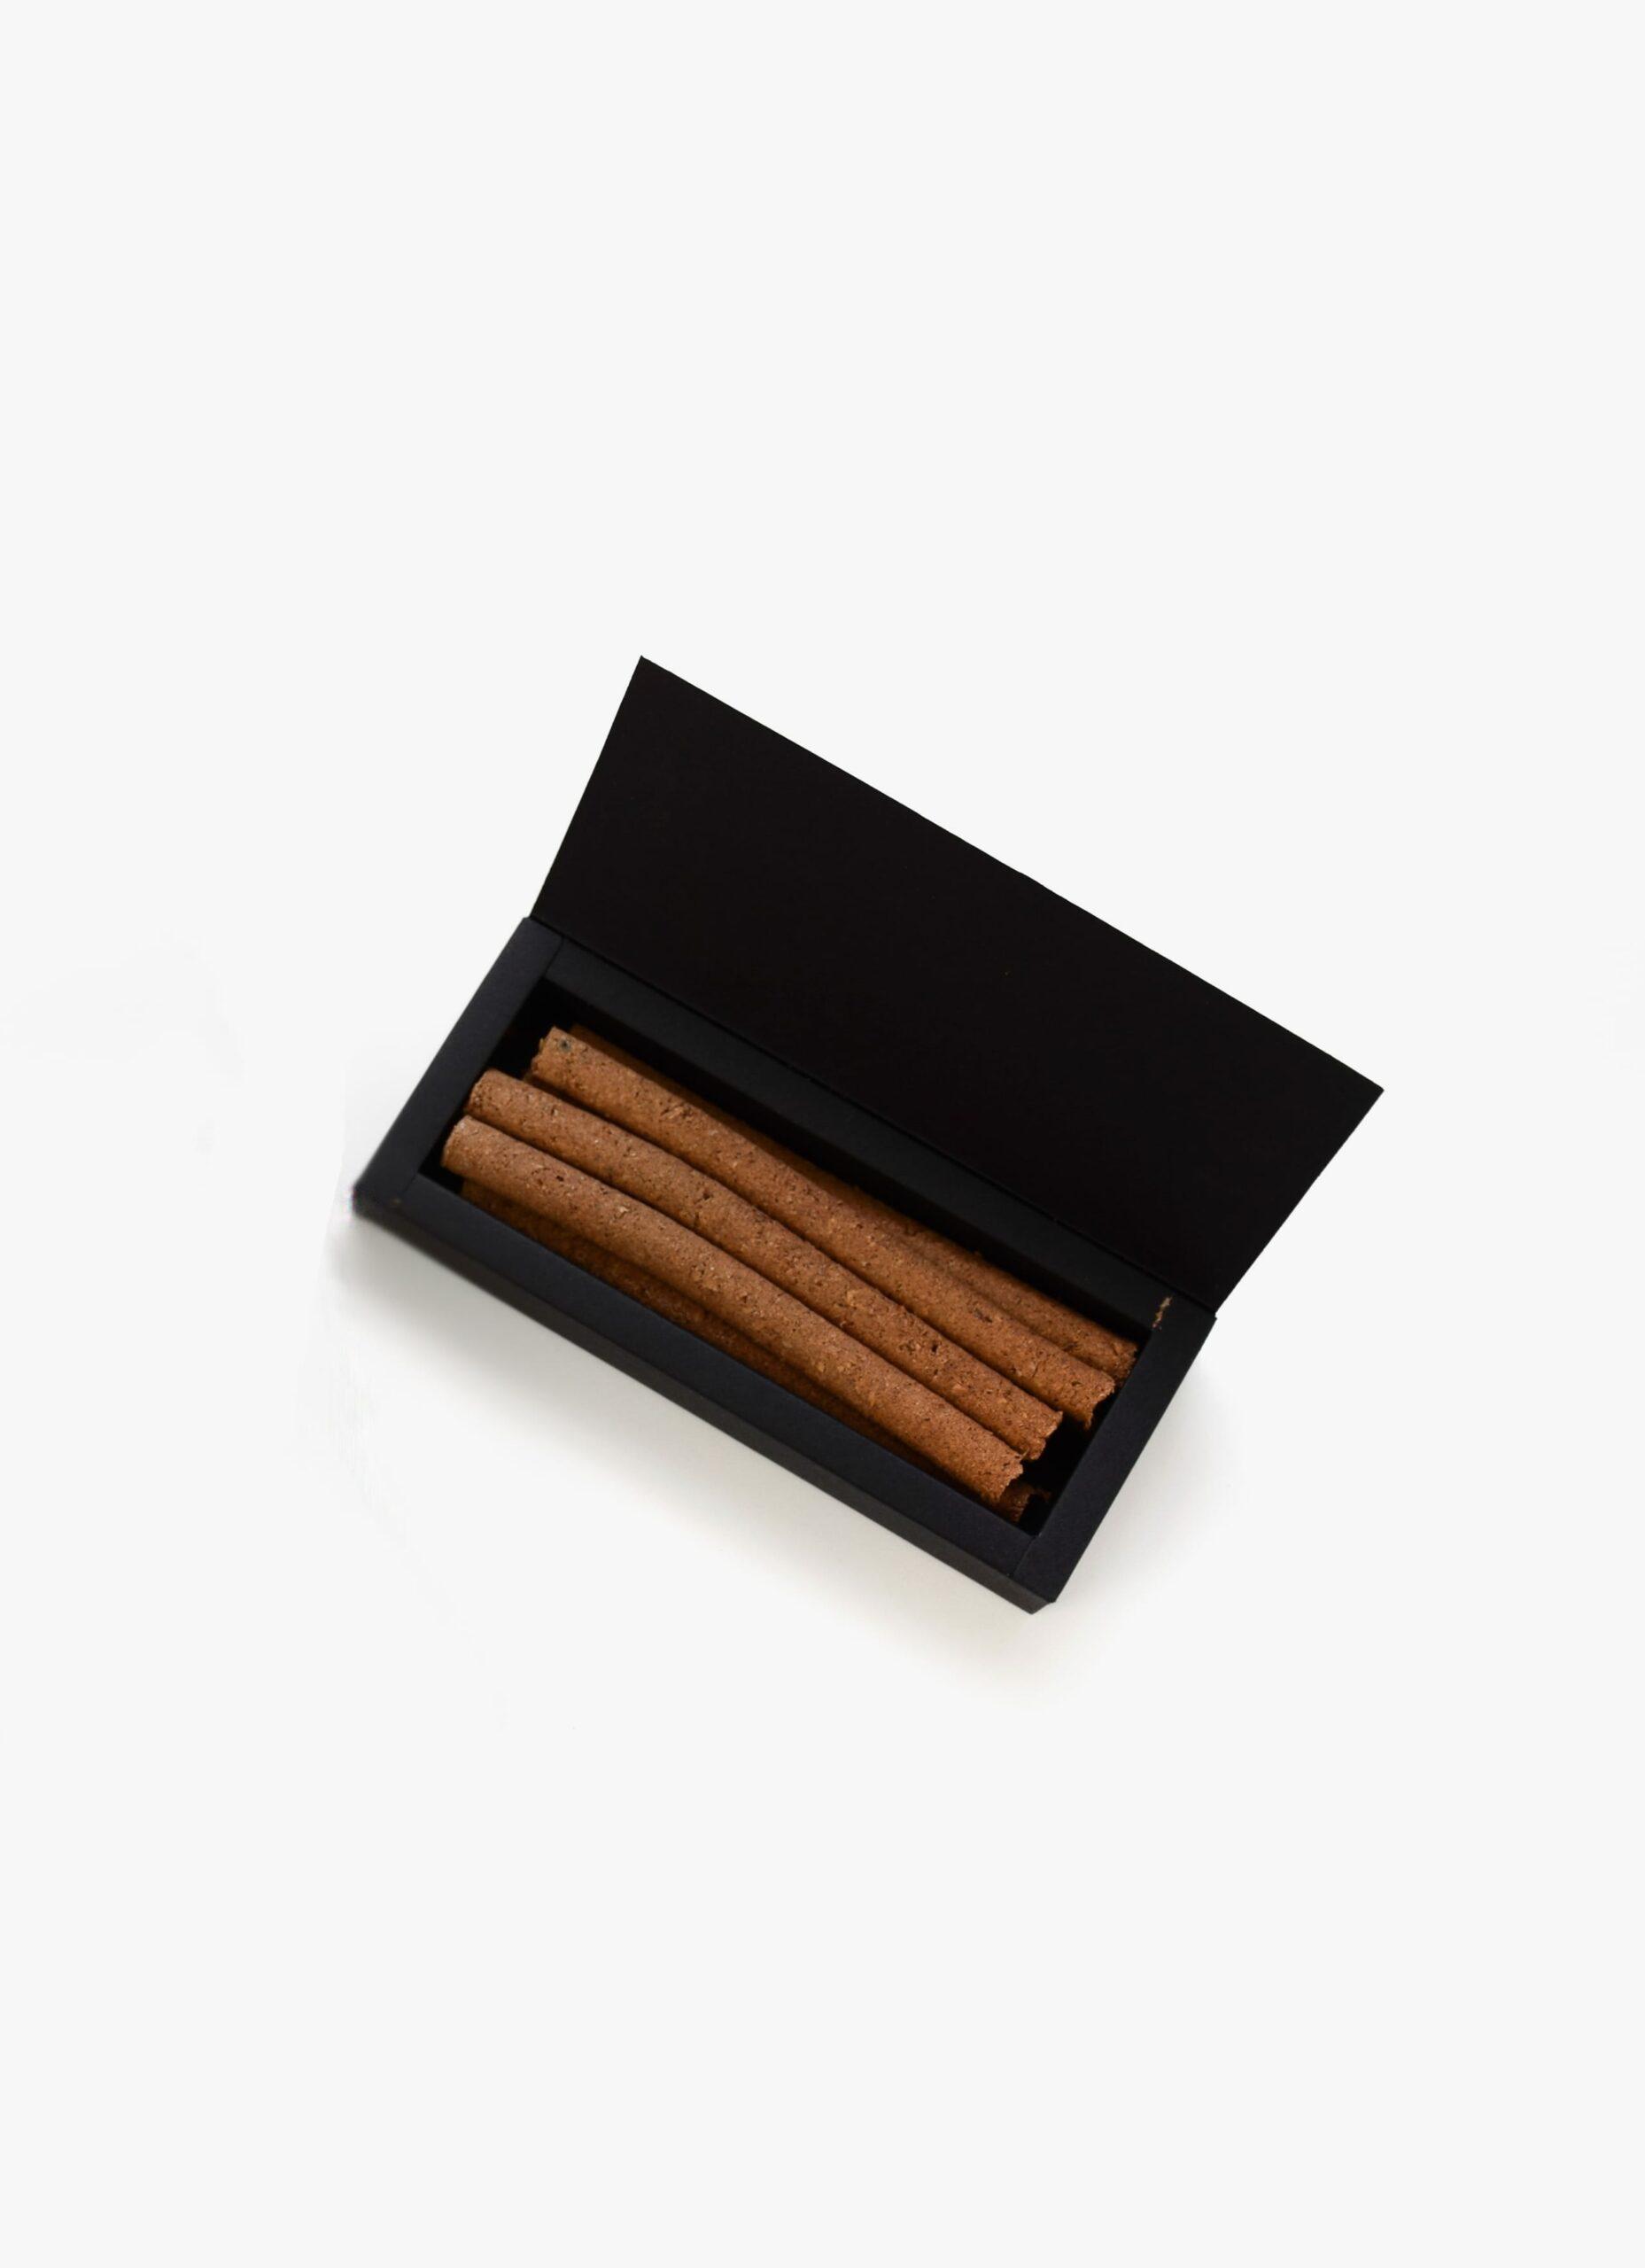 Incausa - Makko Incense bricks - Palo Santo - Sandal